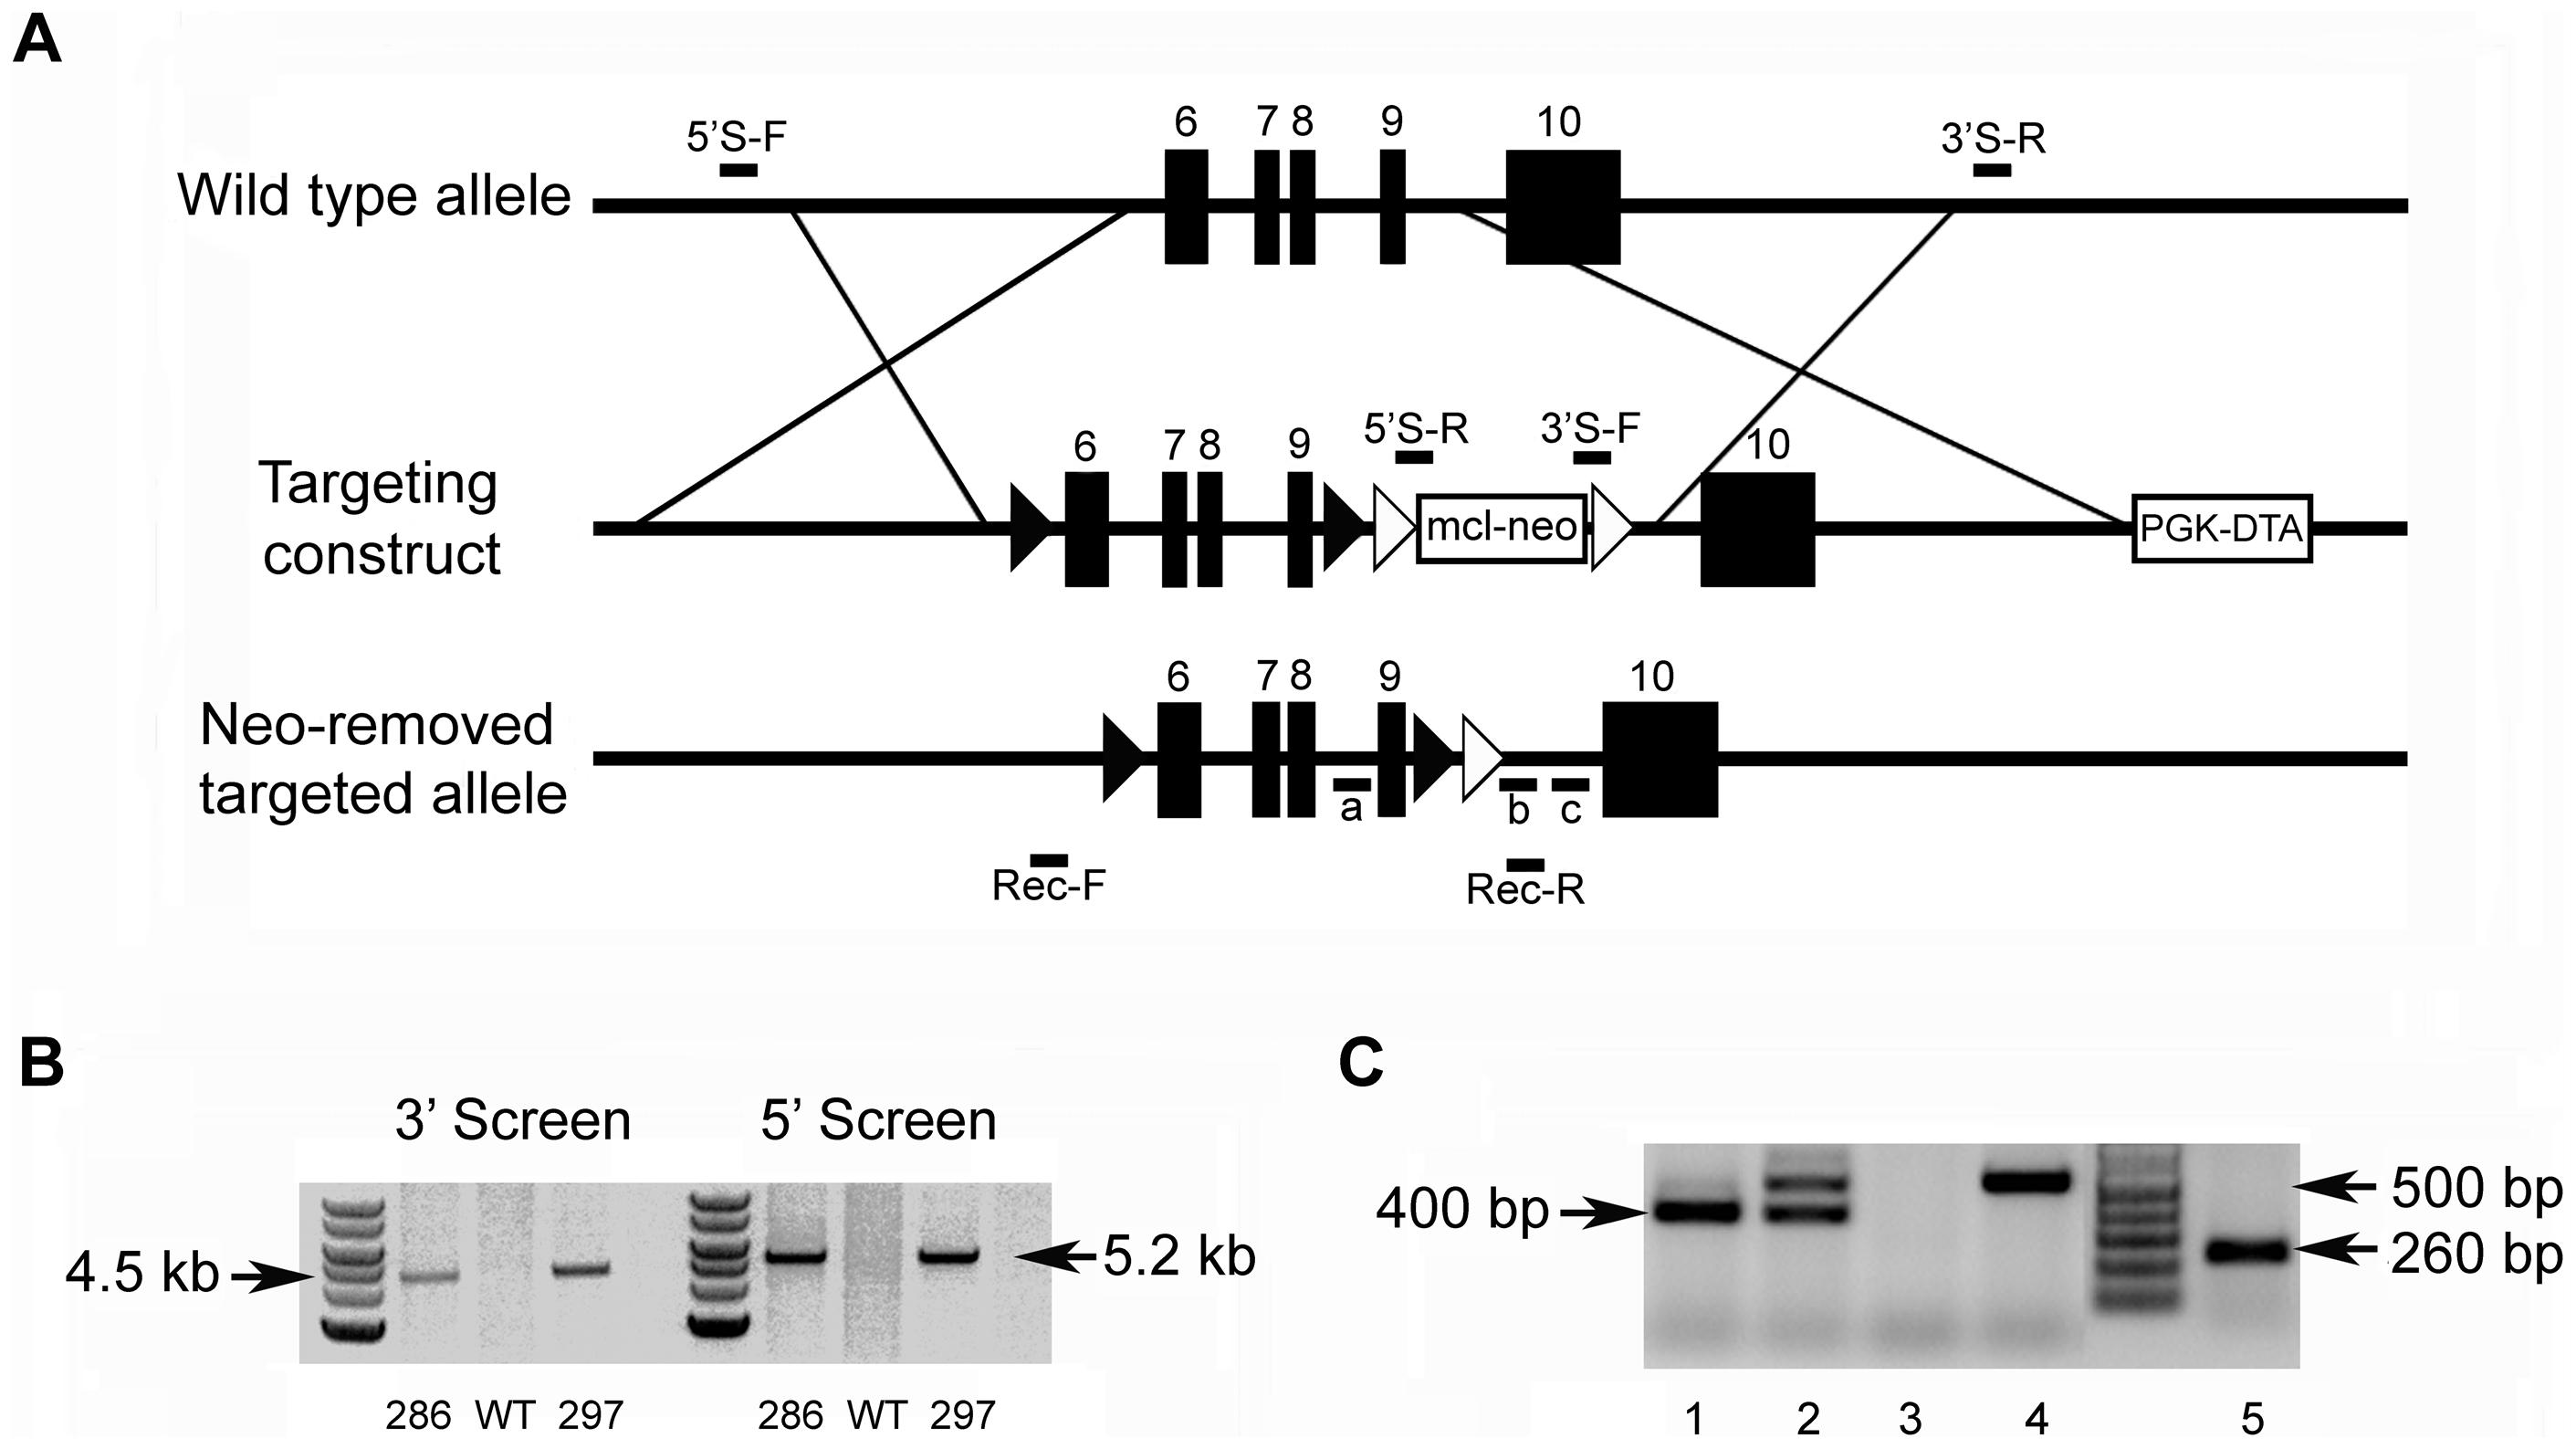 Generation of the <i>Fam20c</i> floxed alleles and <i>Fam20c</i> null alleles.